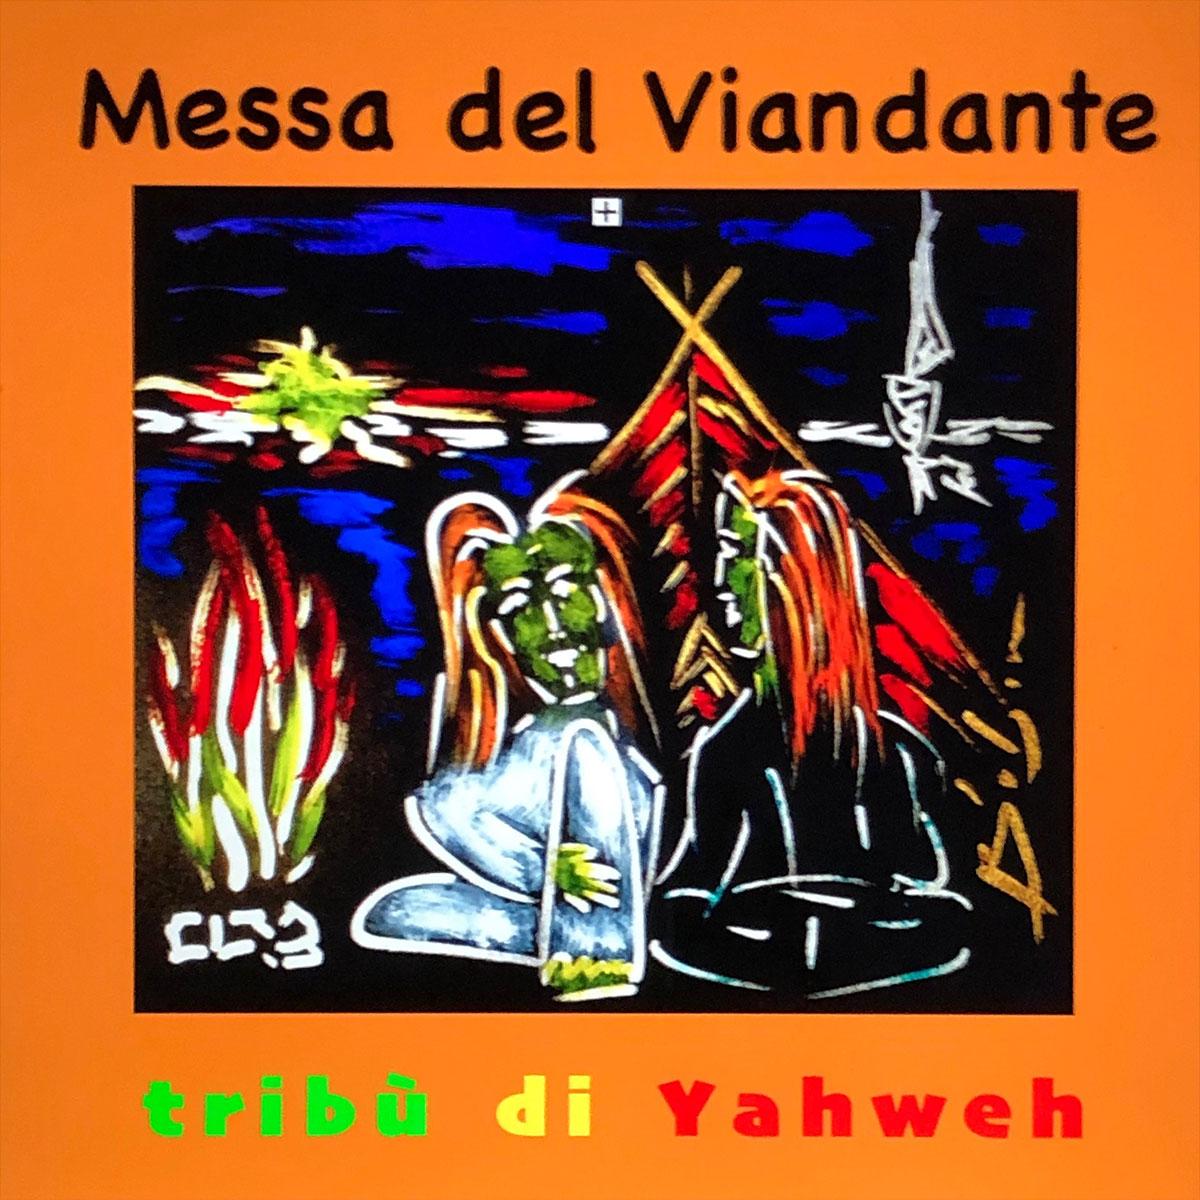 http://www.tribudiyahweh.com/wp/wp-content/uploads/2019/02/messa-del-viandante.jpg